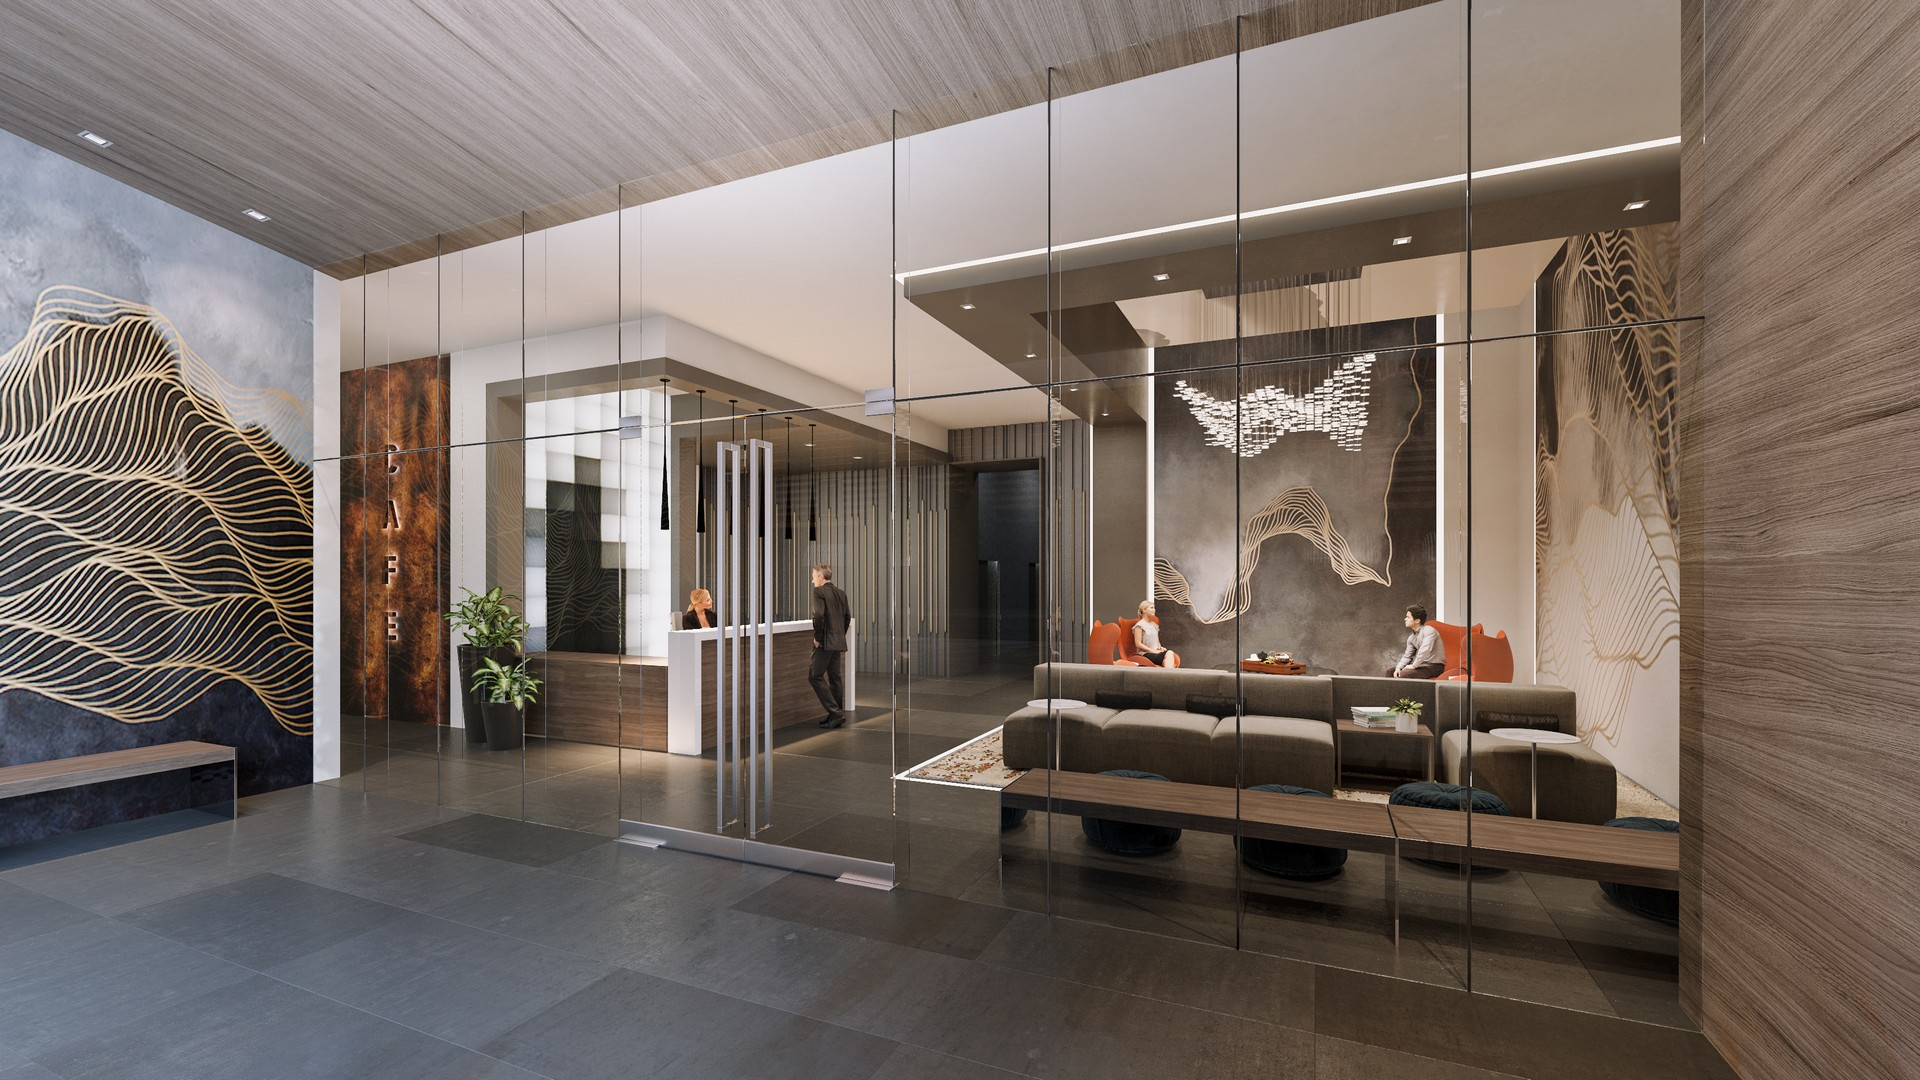 Additional photo for property listing at NEXUS #1803 1200 Howell St #1803 Seattle, Washington 98101 United States